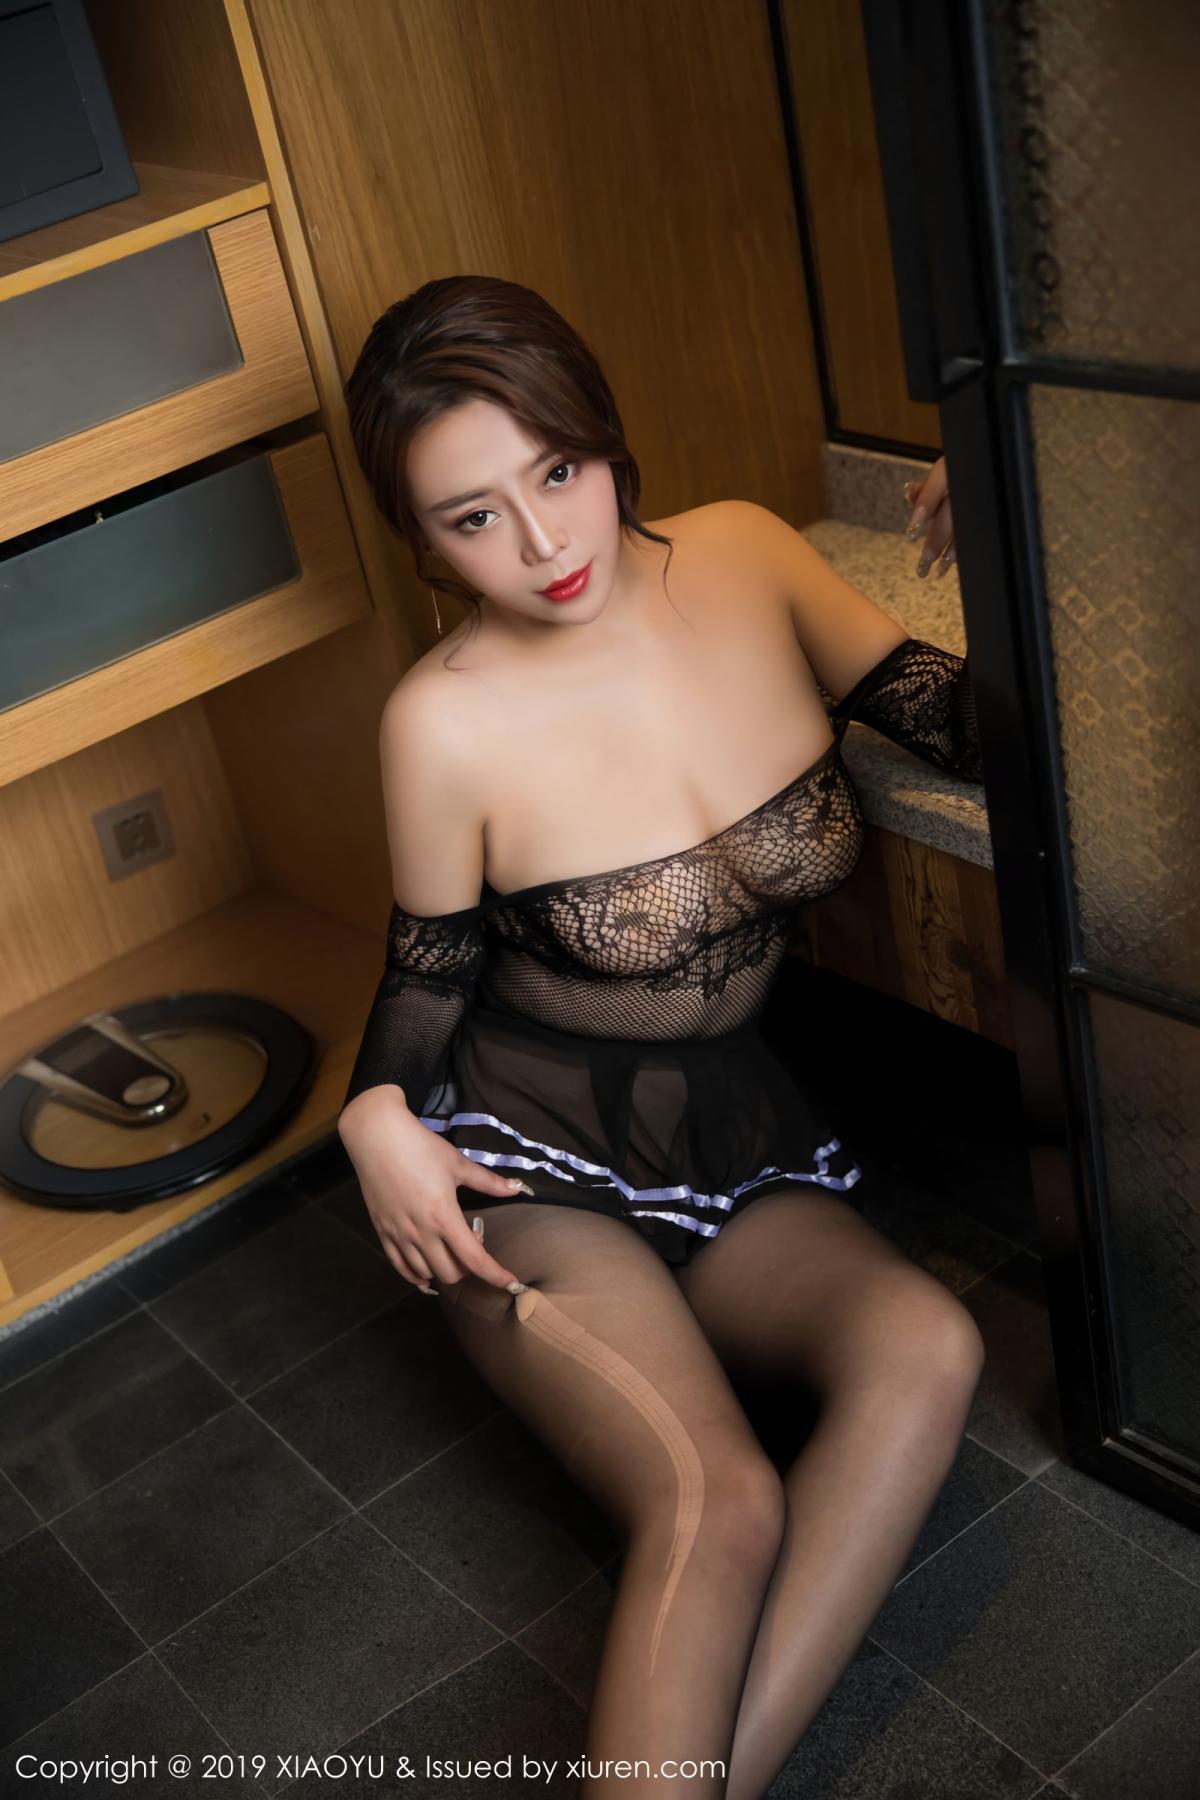 [XiaoYu] Vol.016 Miki Tu 28P, Miki Tu, Tall, XiaoYu